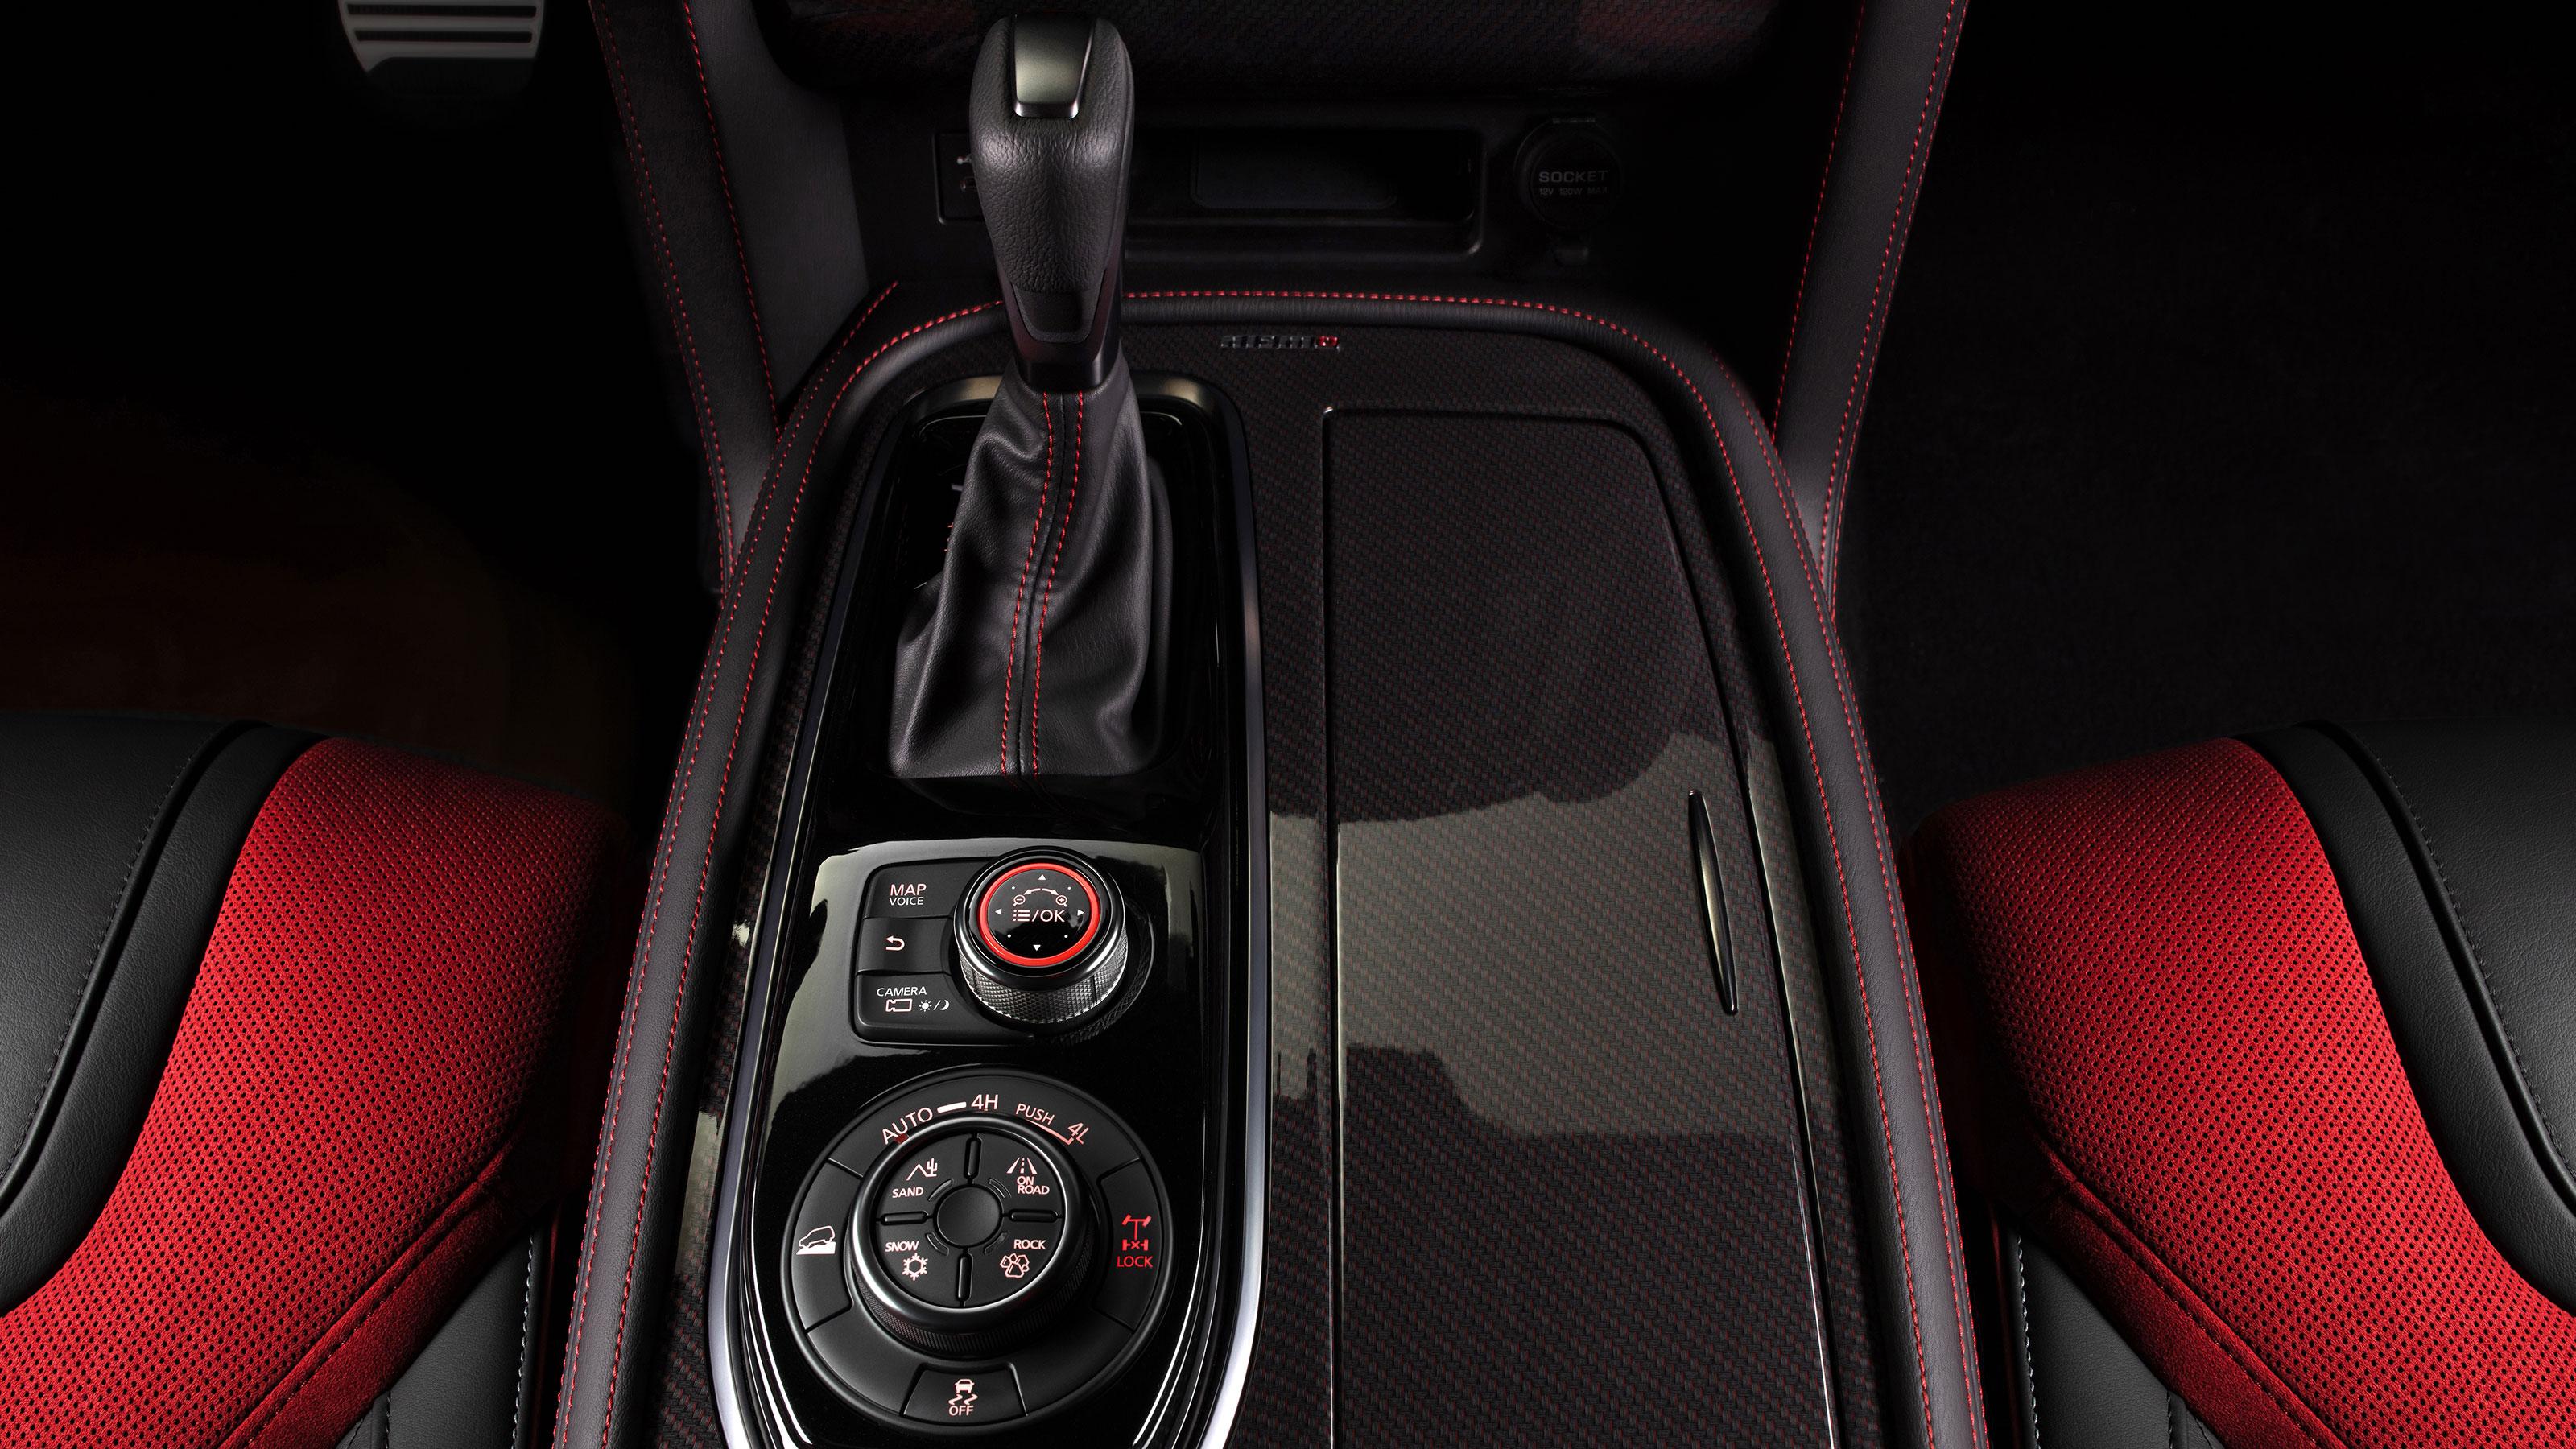 Nissan PATROL NISMO AC and transmission